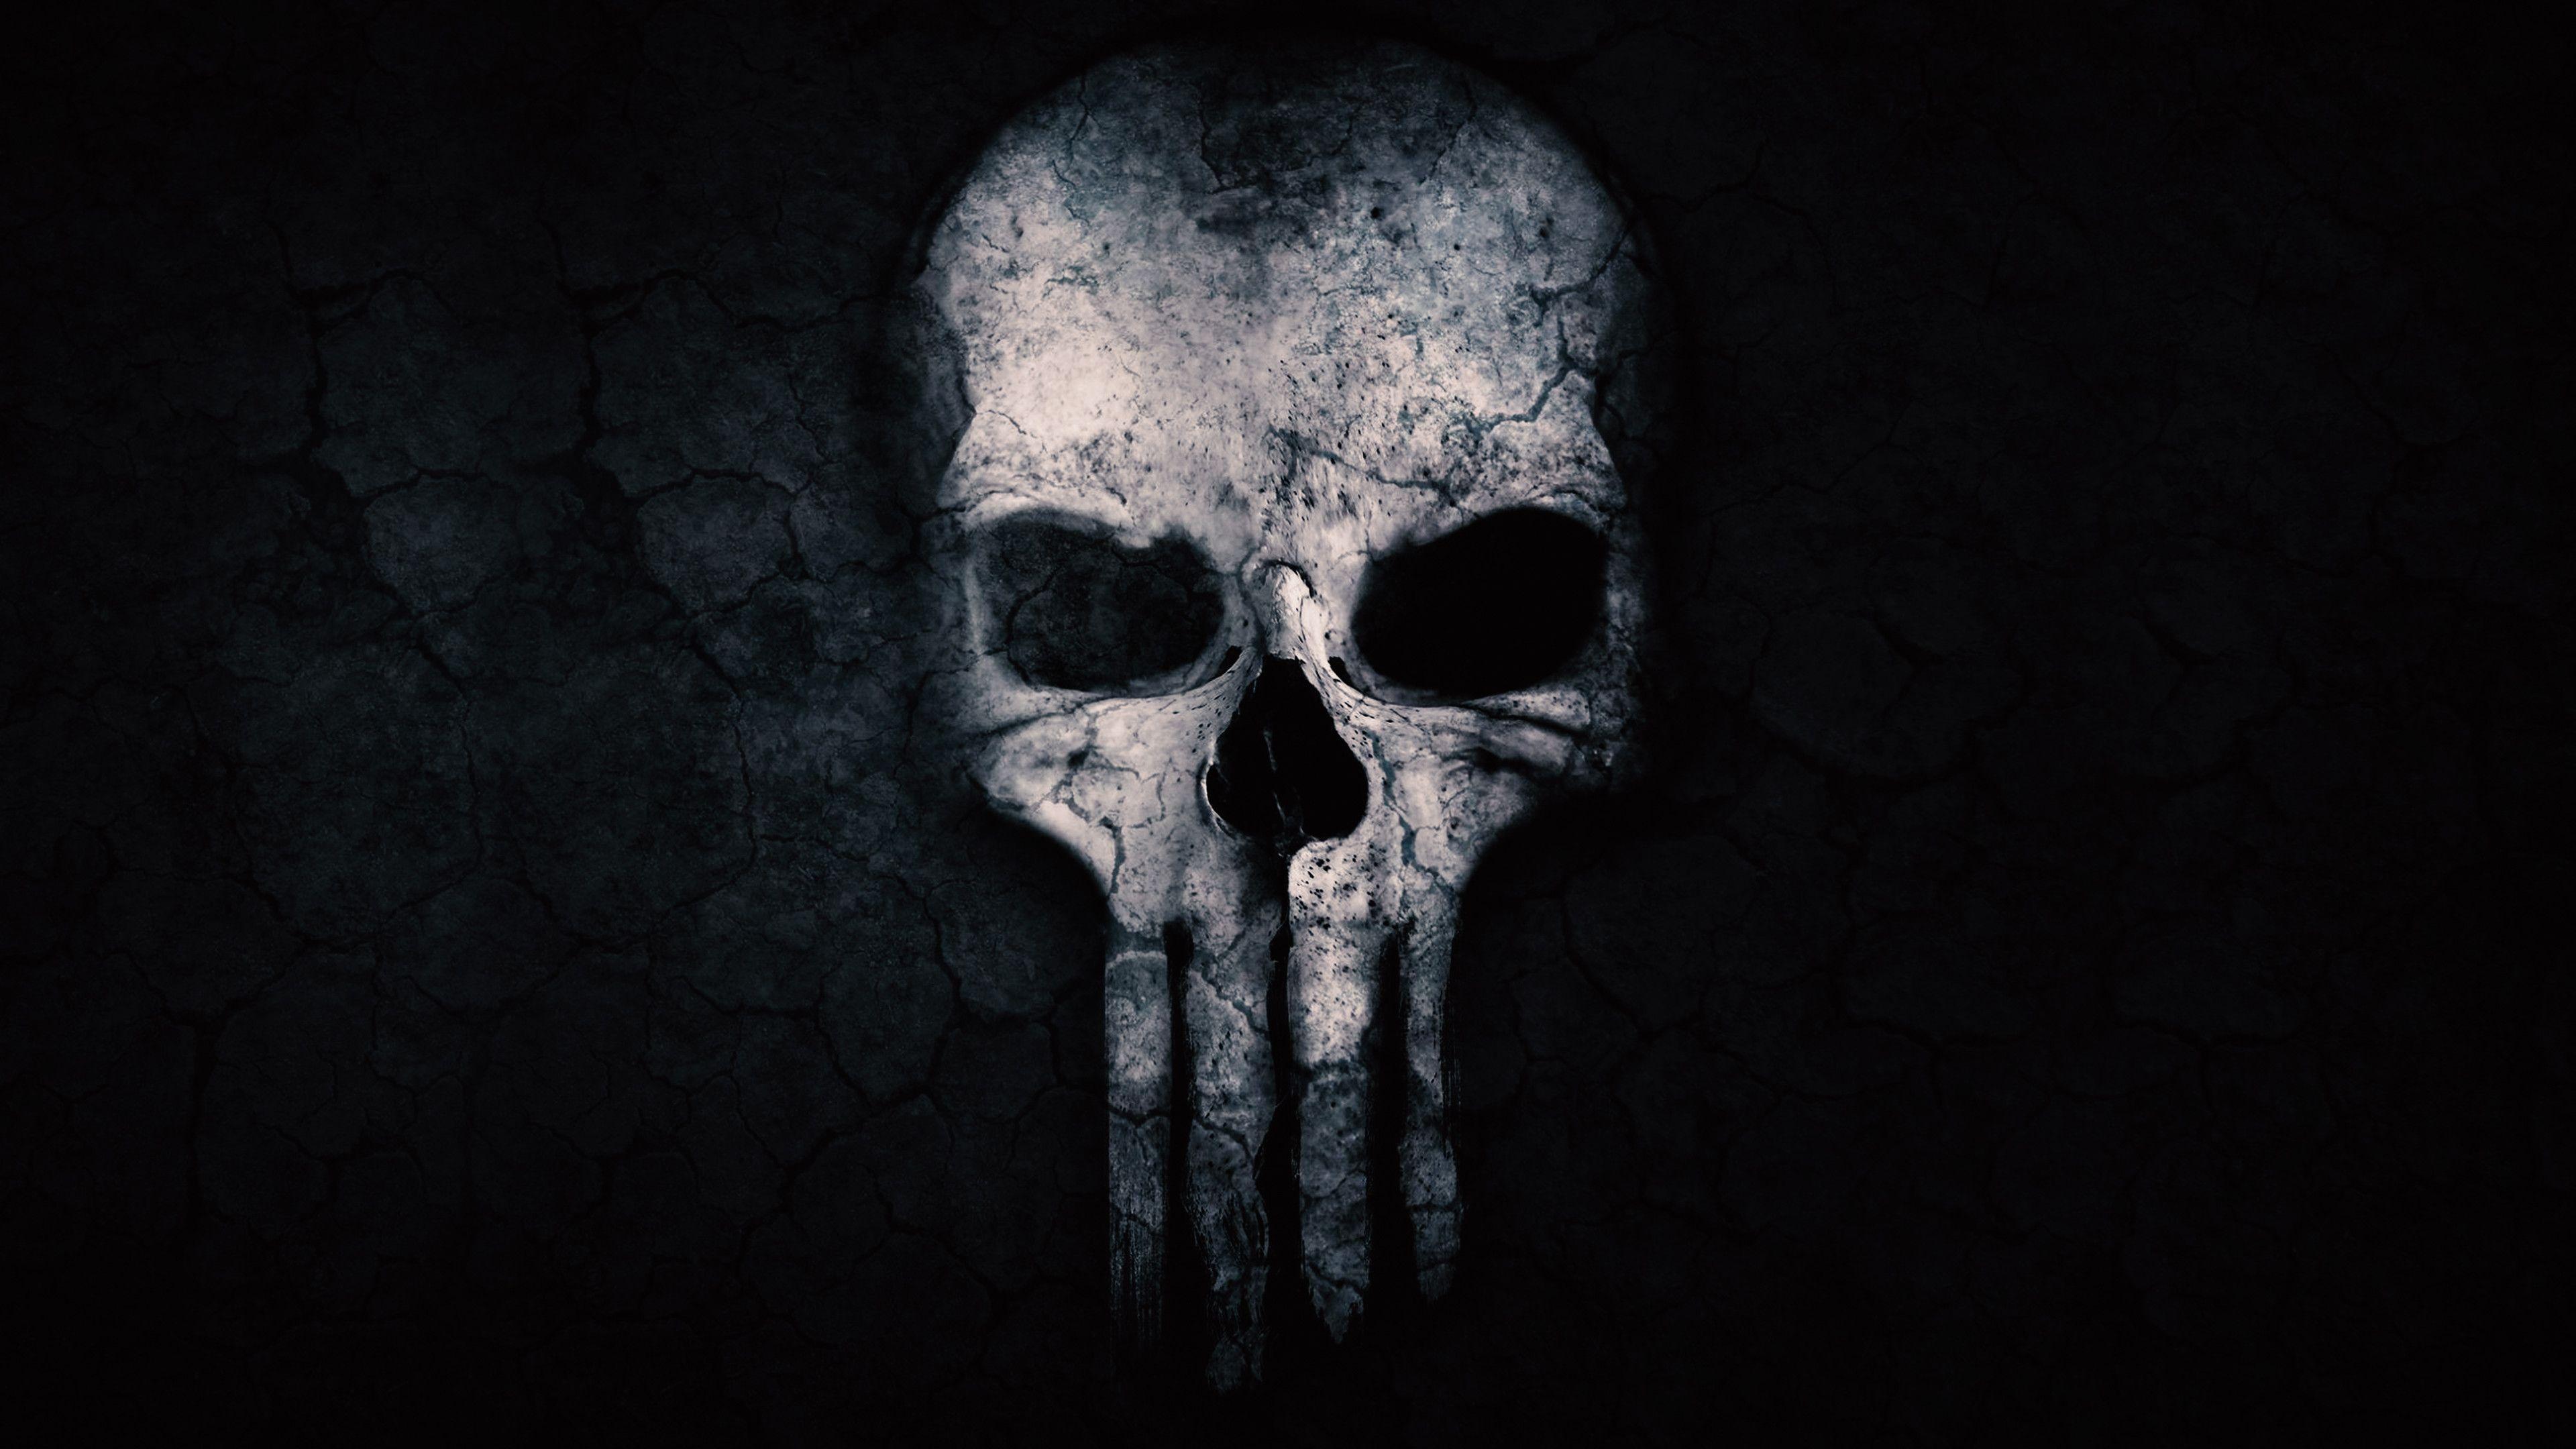 Punisher Logo Wallpapers Top Free Punisher Logo Backgrounds Wallpaperaccess